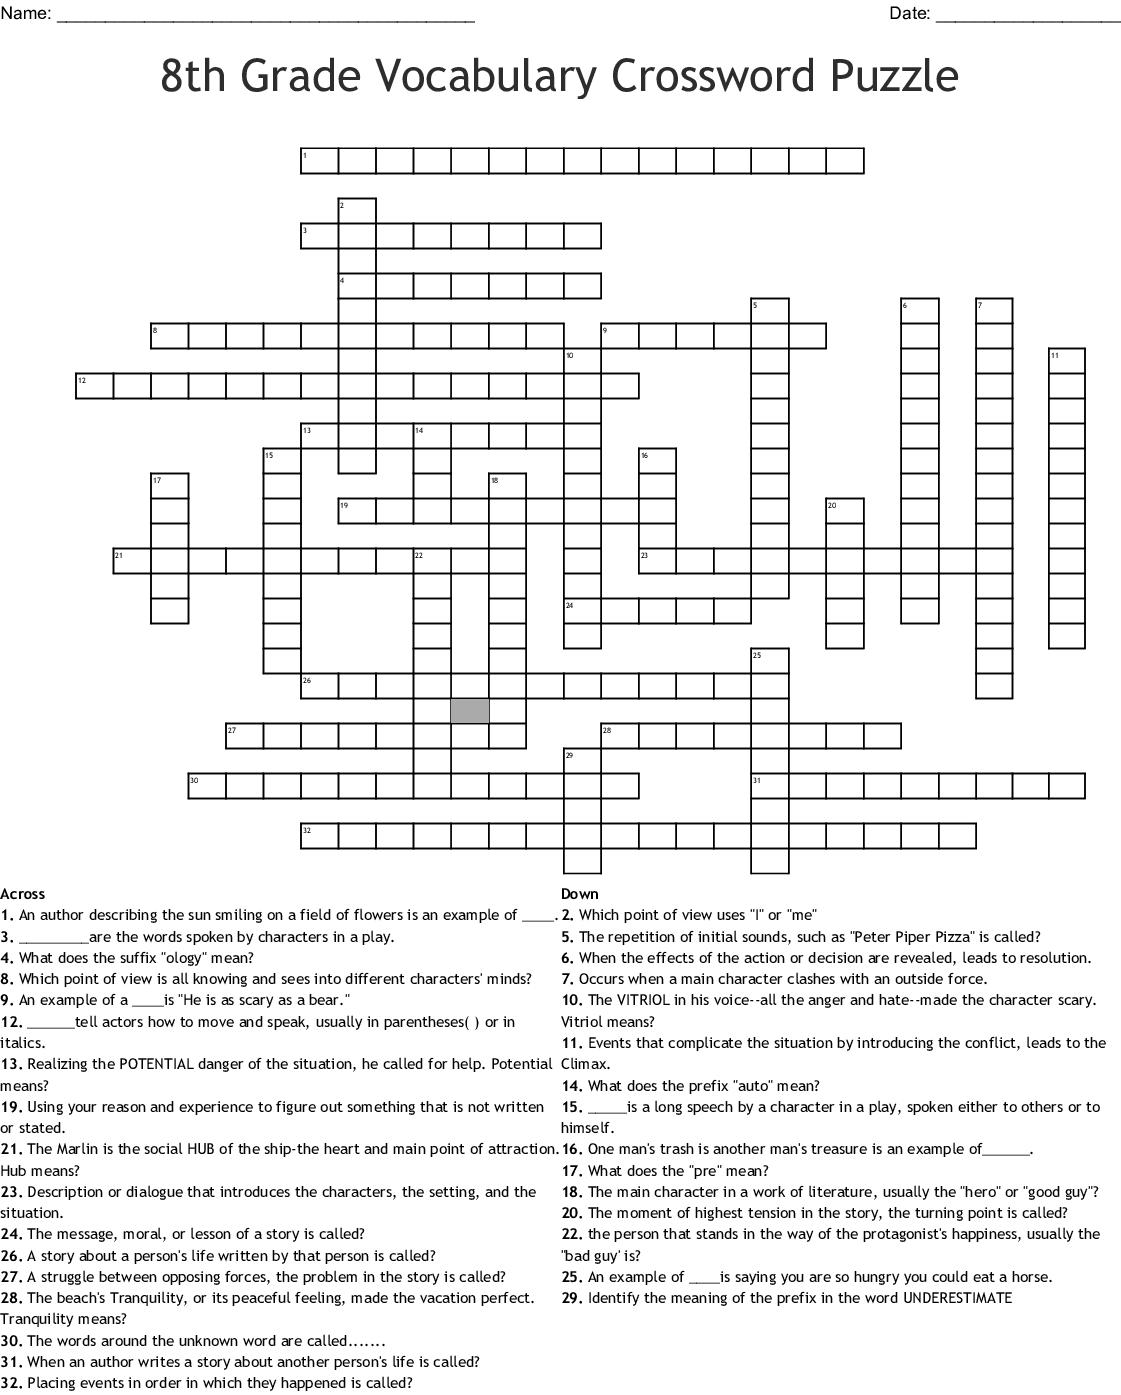 Story Elements Crossword